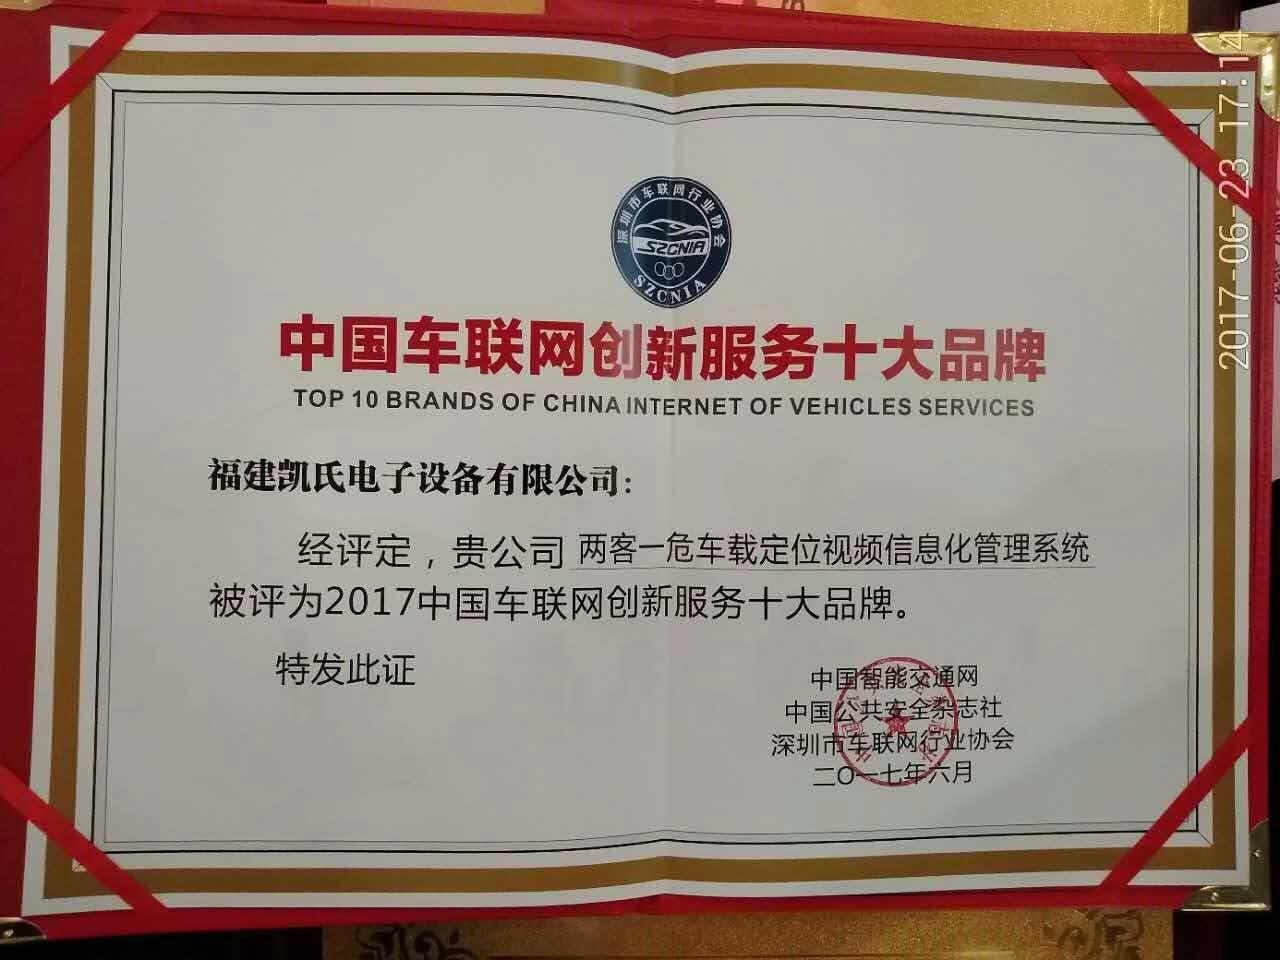 <span>2017年中國車聯網創新服務十大品牌</span>